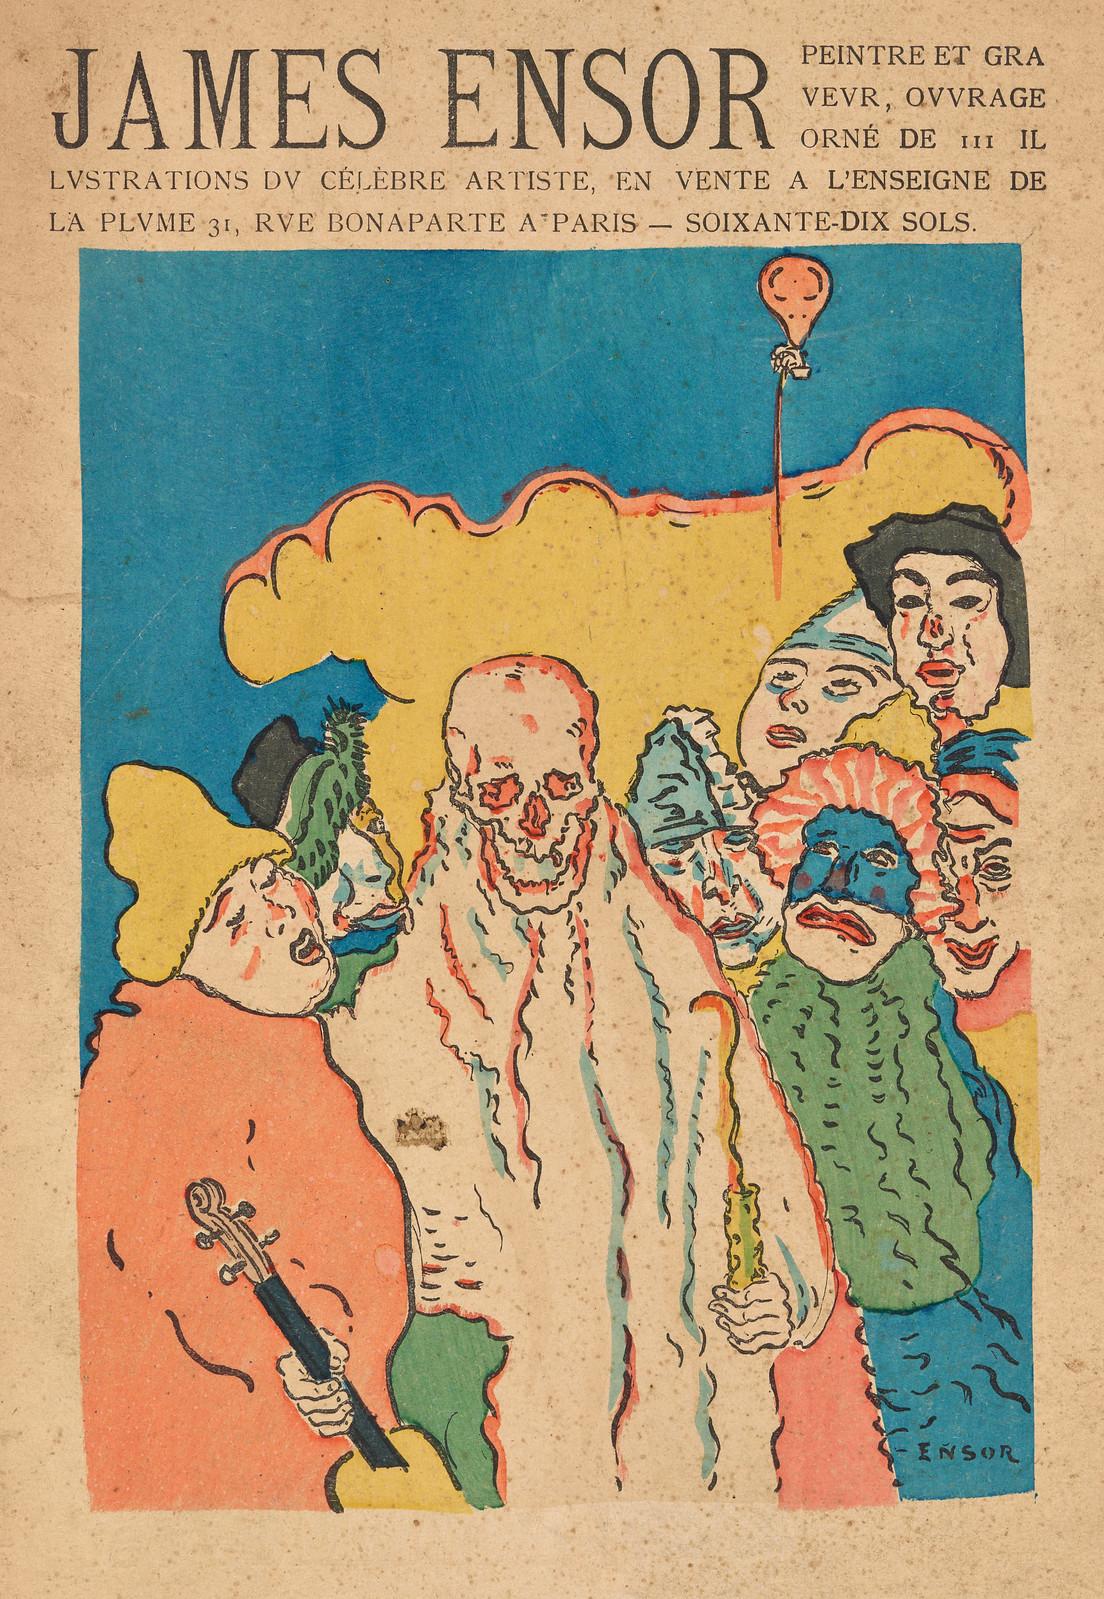 James Ensor - Cover art for Peintre and Graveur, 1899